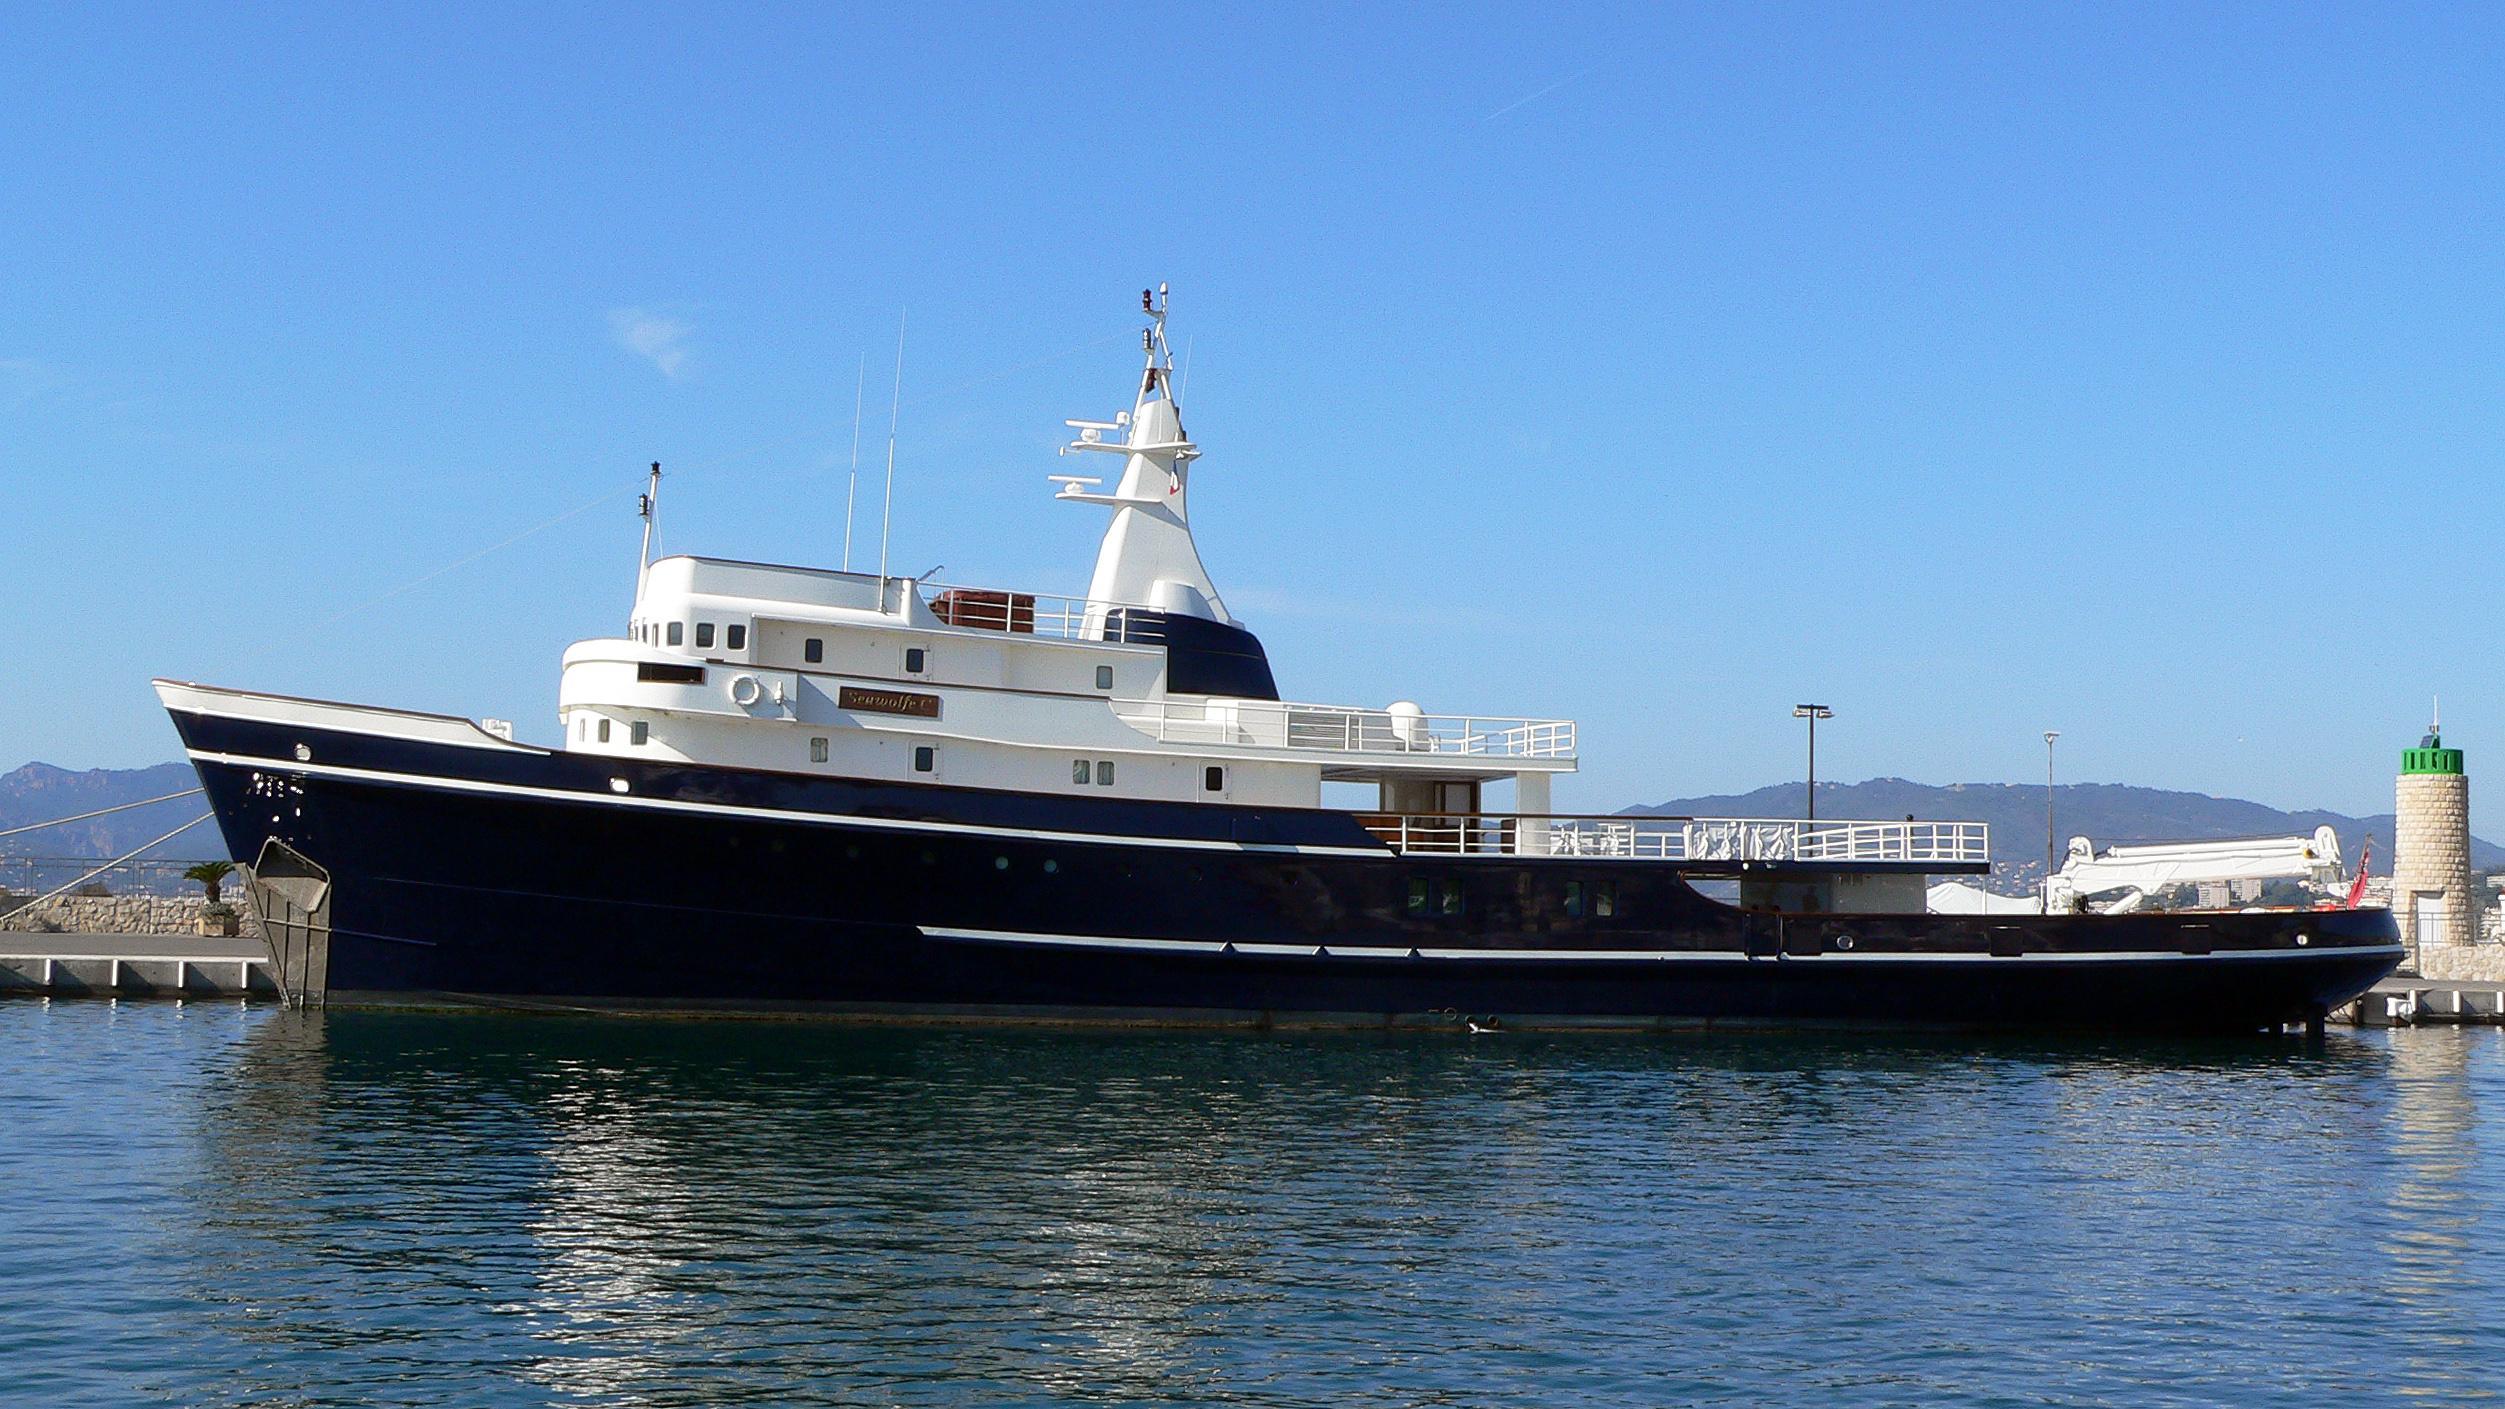 seawolf-expedition-yacht-jk-smit-1957-59m-profile